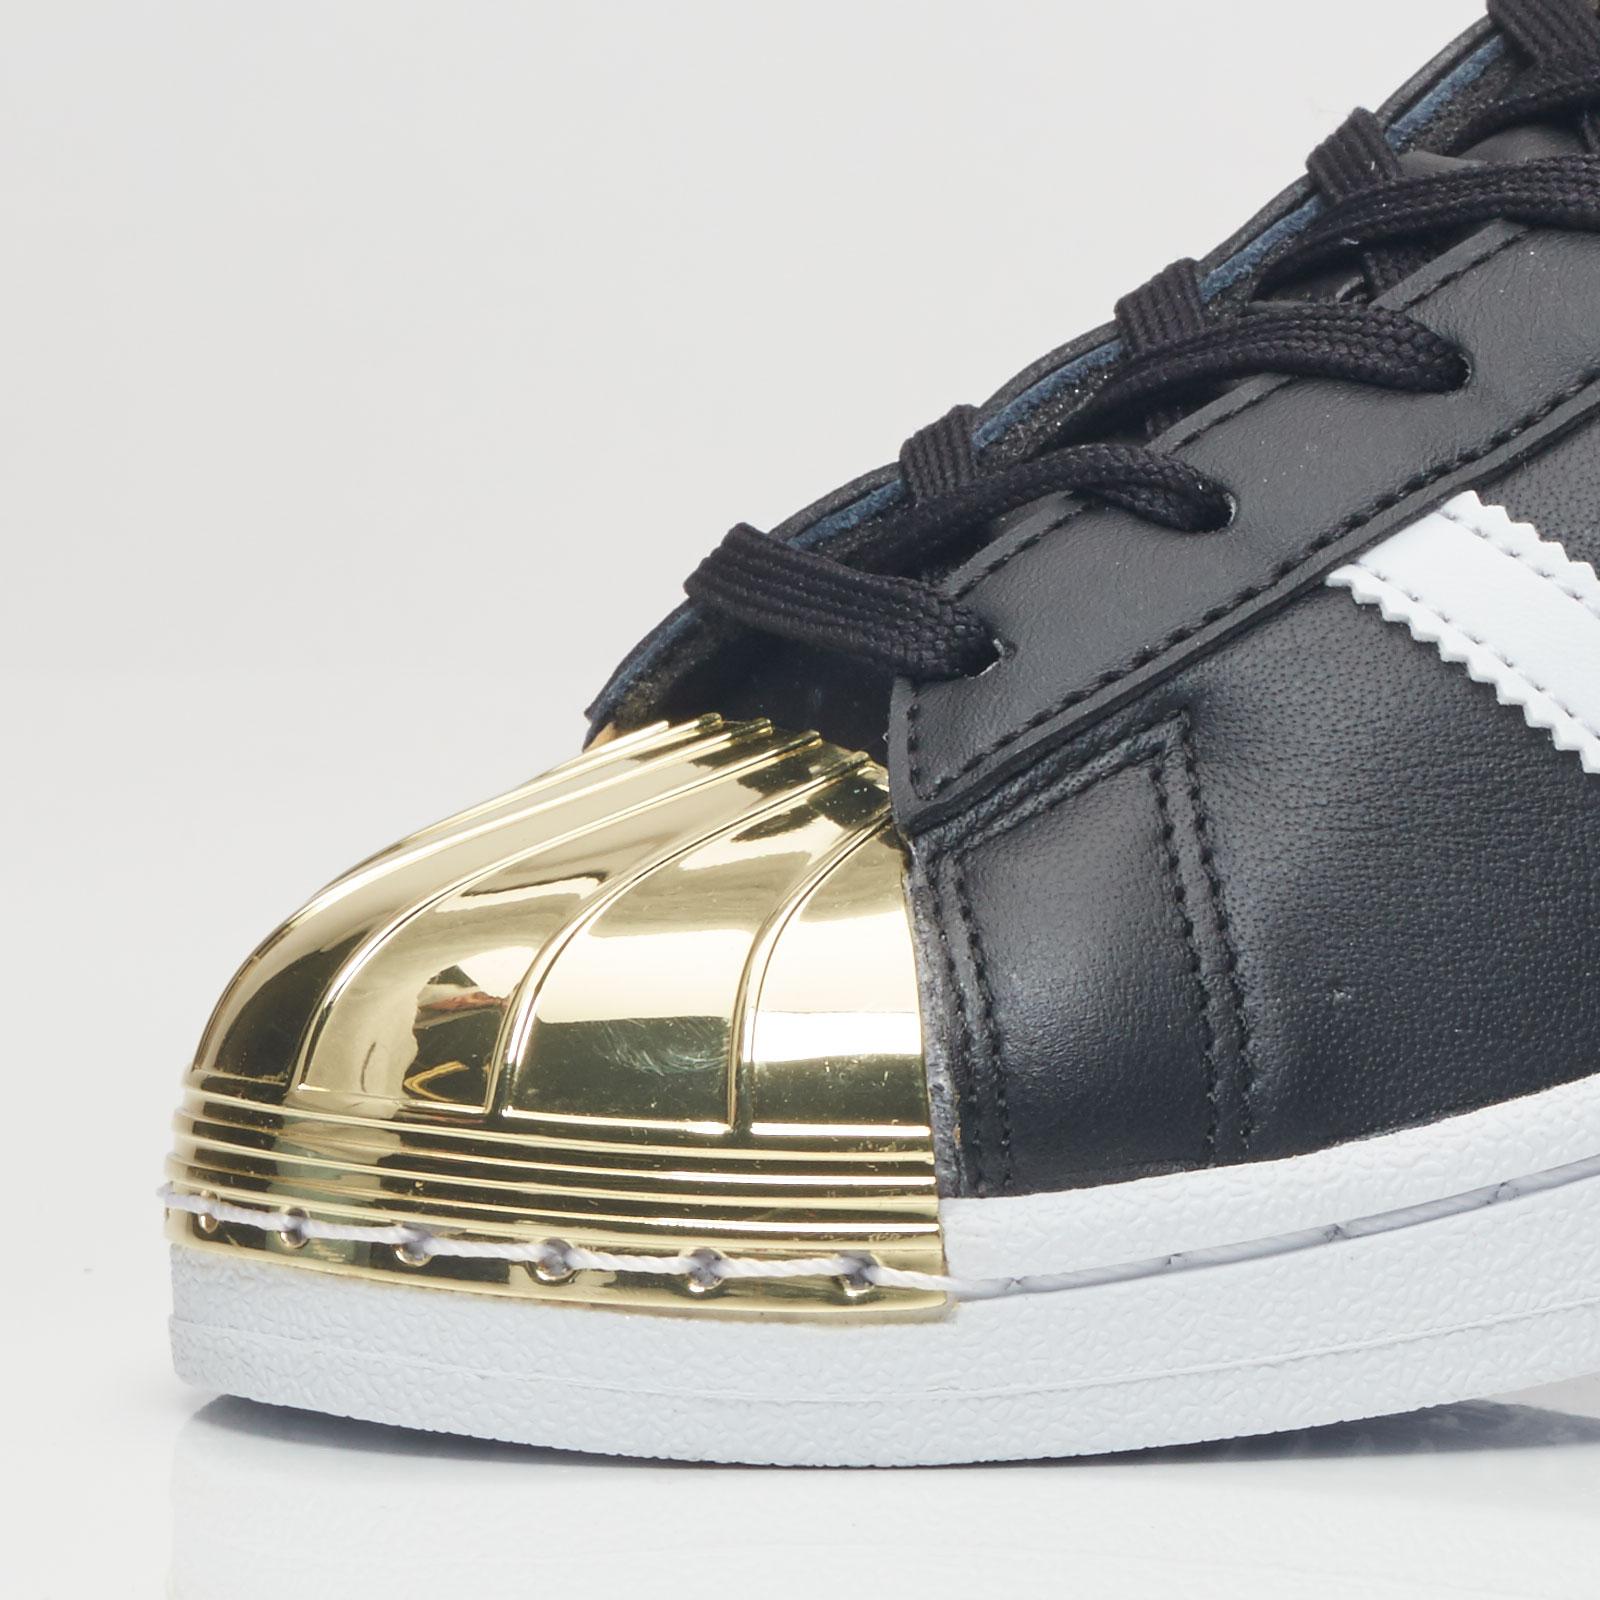 outlet store 3e7d0 94b79 ... adidas Originals Superstar 80S Metal Toe W ...